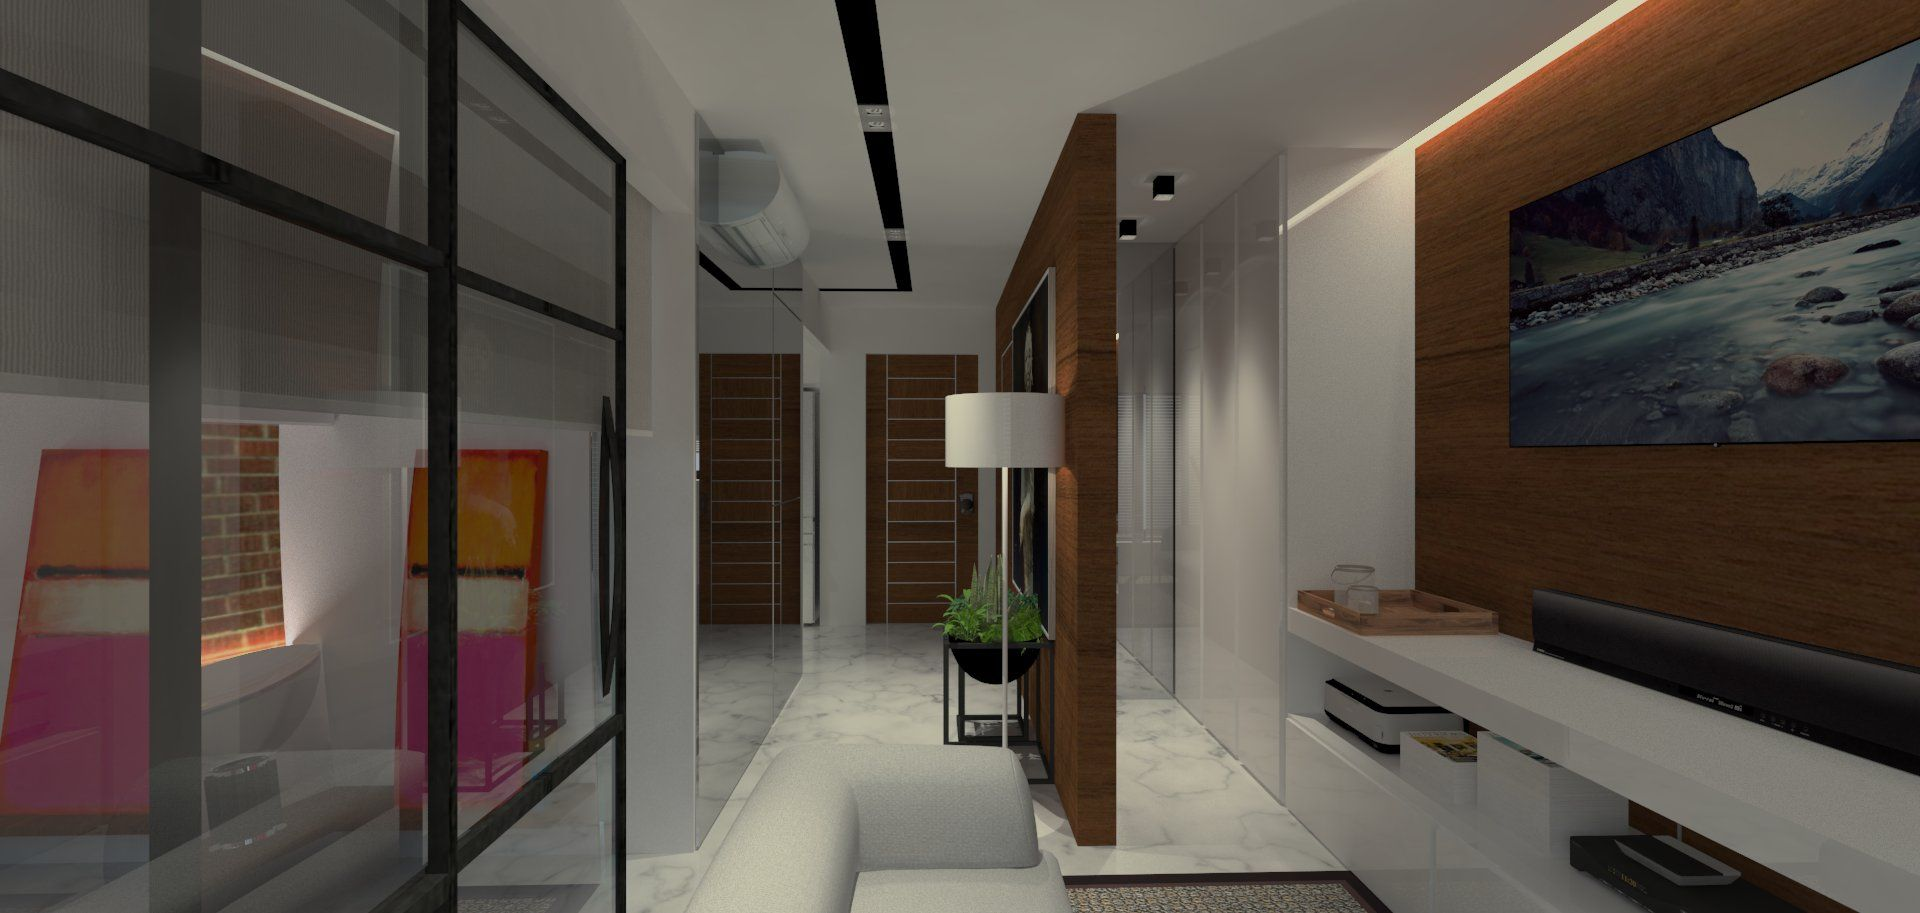 Hdb Bto For Singles 2 Room 47sqm Hdb Apartment In Sengkang